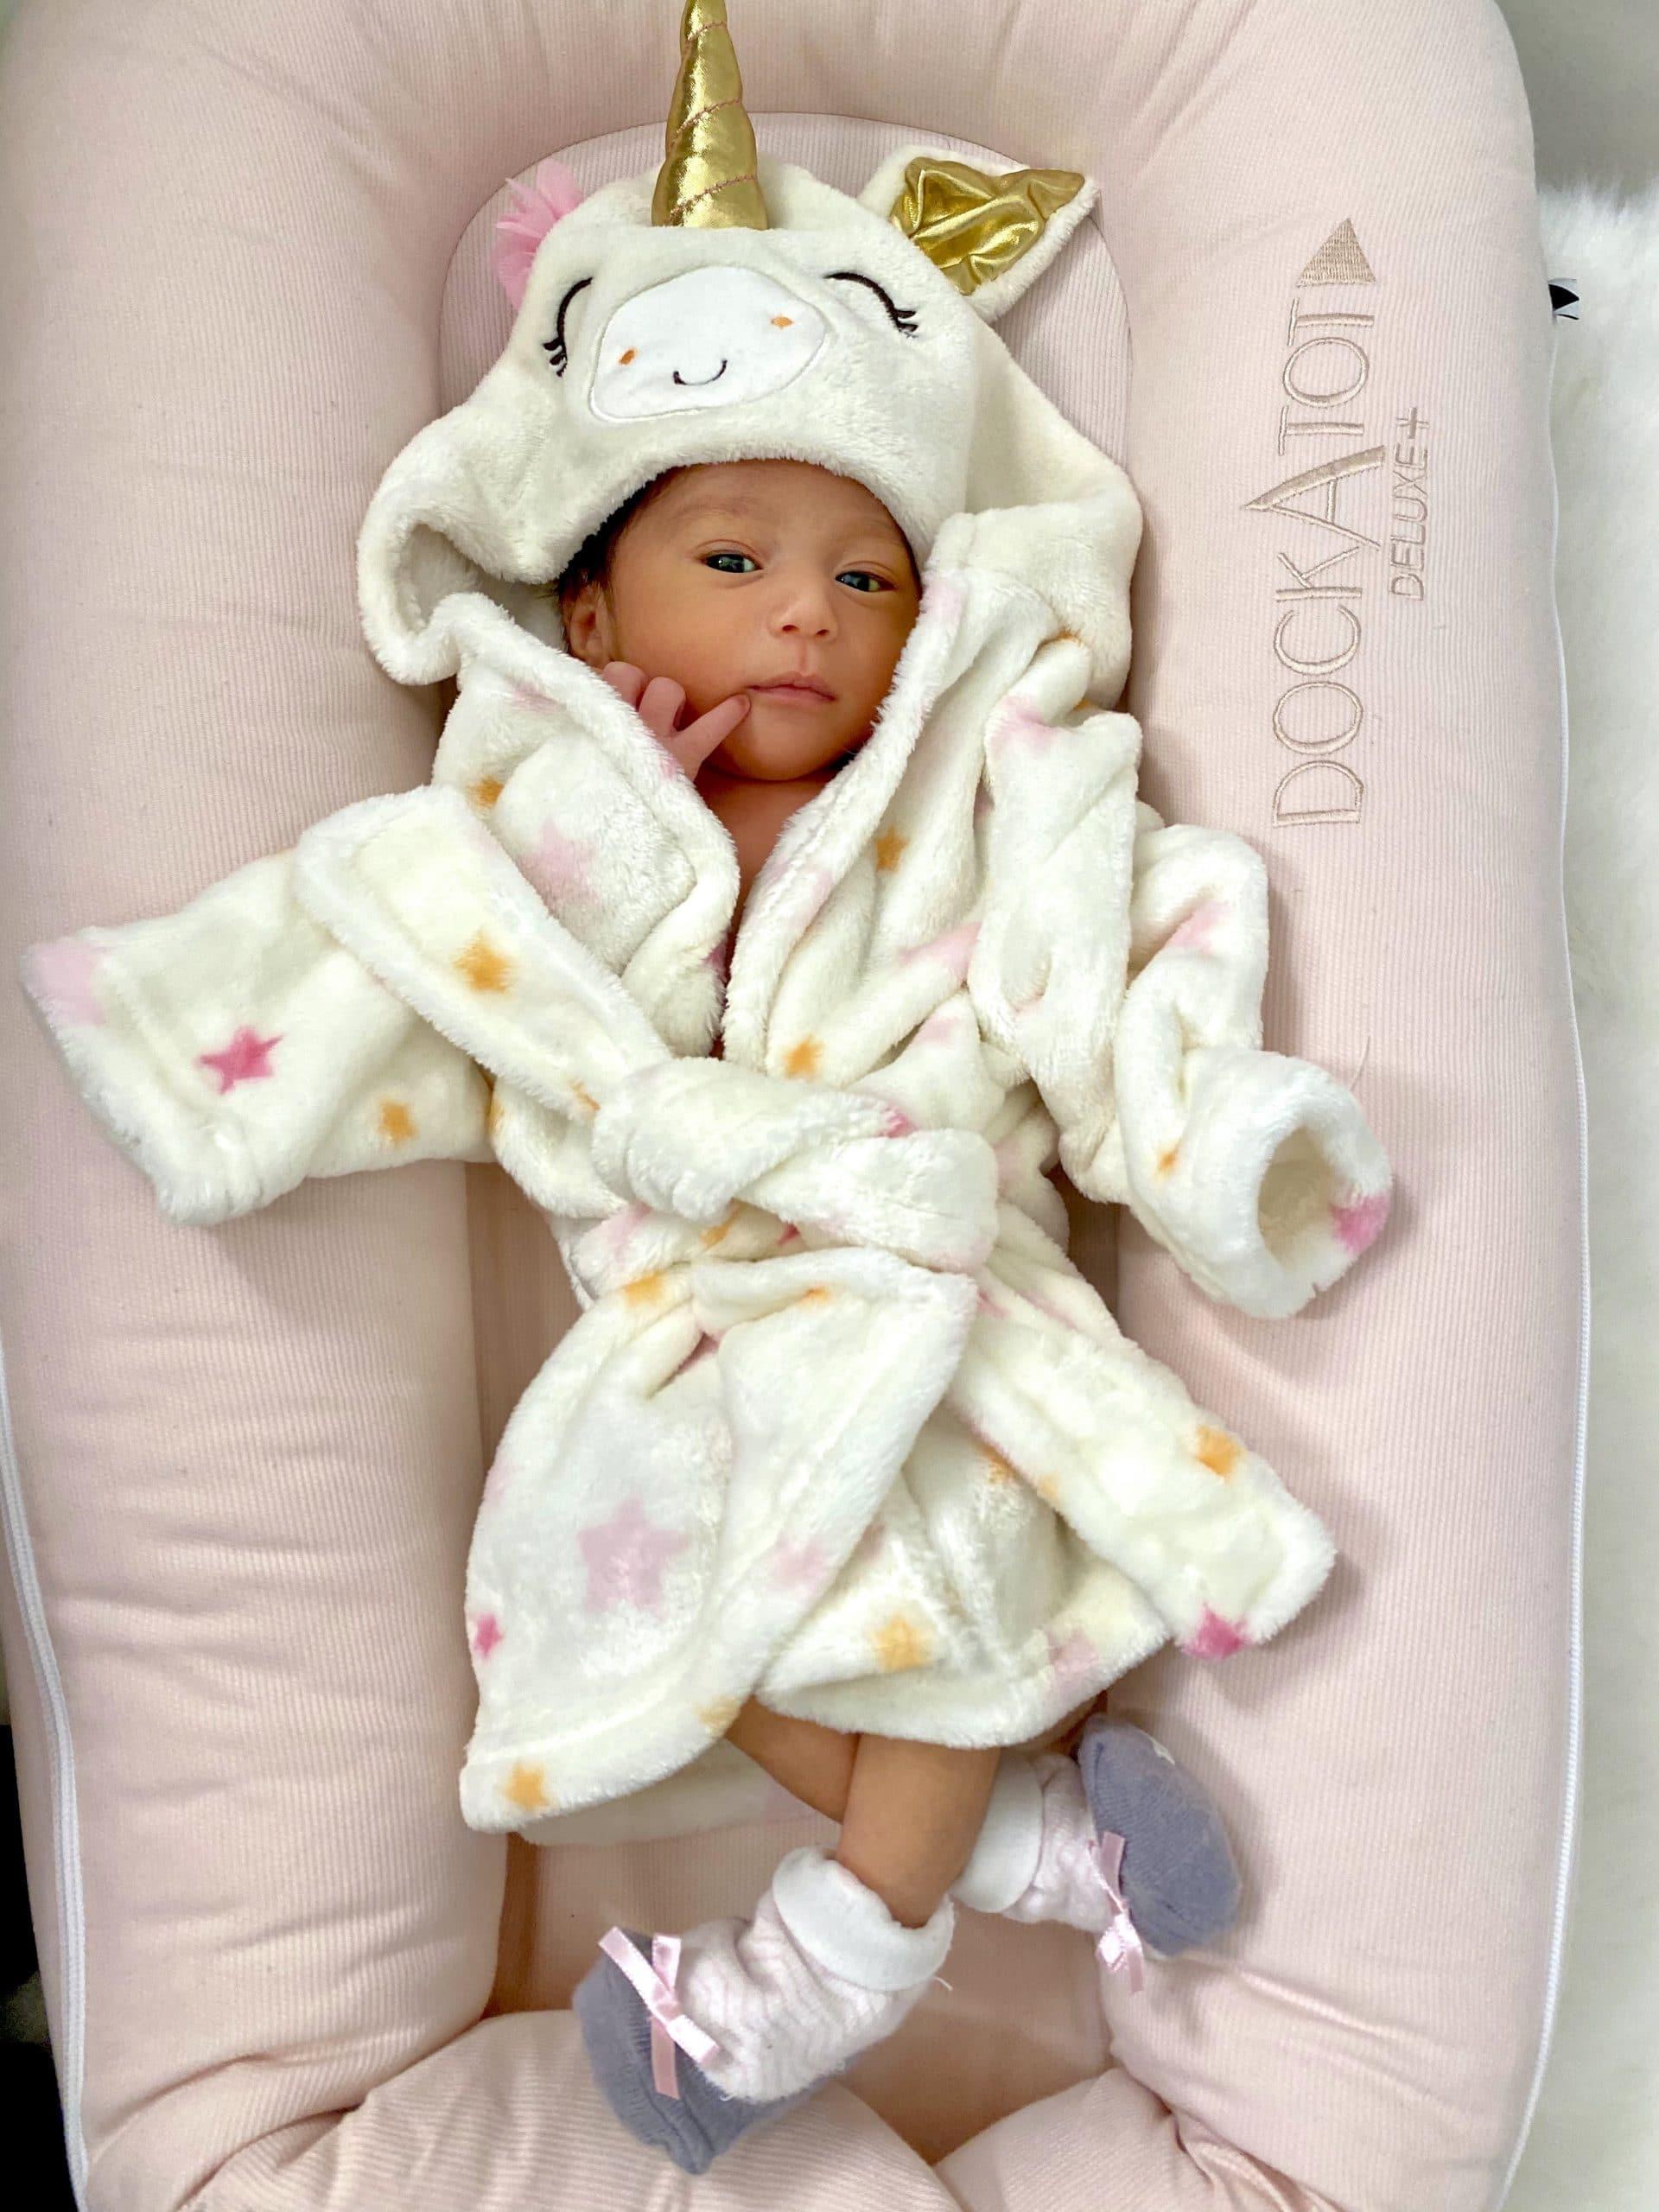 Dhar Manns baby Ella Rose